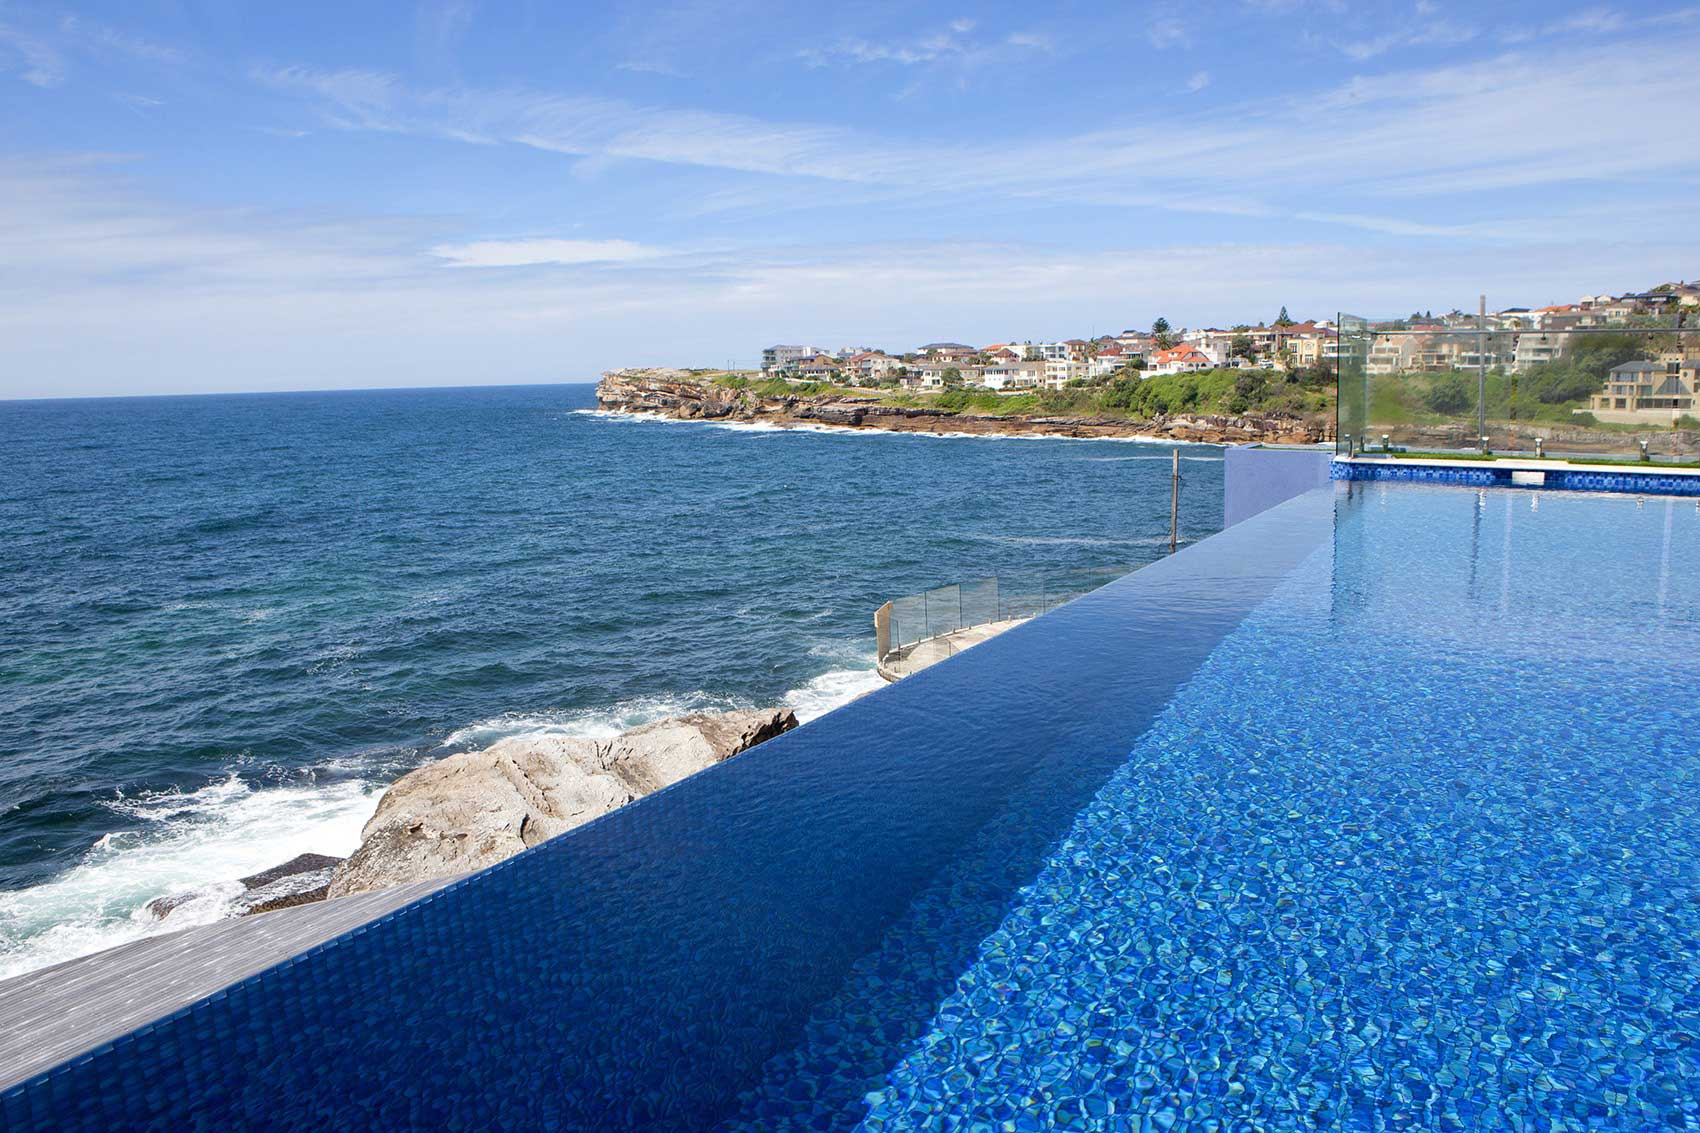 Relaxing Infinity Pool Design No Edges No Boundaries